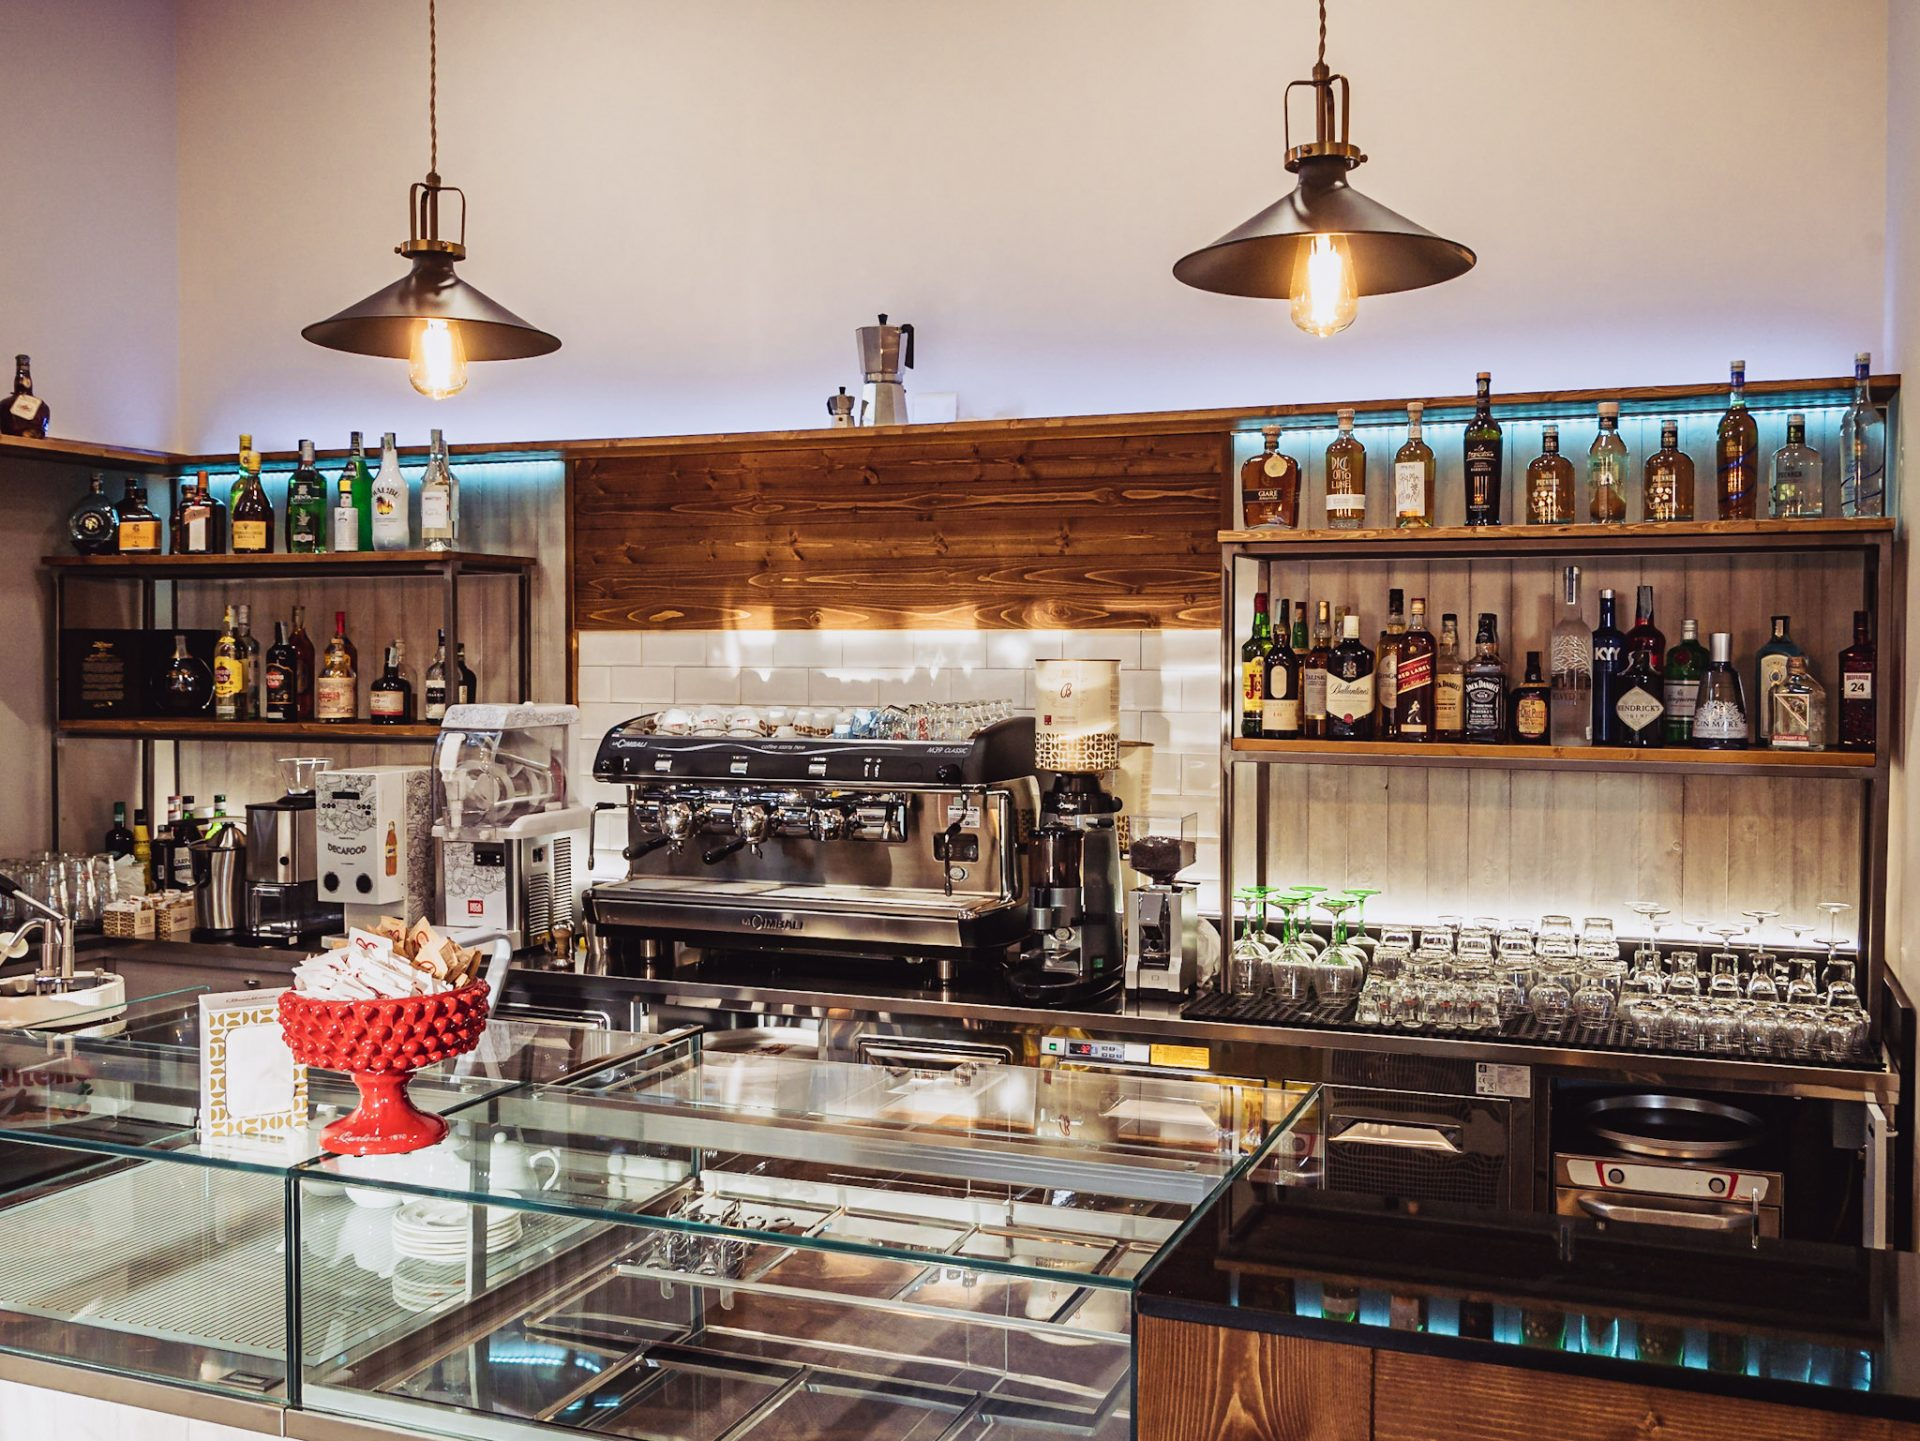 bar_recine_velletri_ristorante_bistrot_enoteca_tabaccheria_hamburgeria_panini_pub_pasta_pranzo_cena_caffe